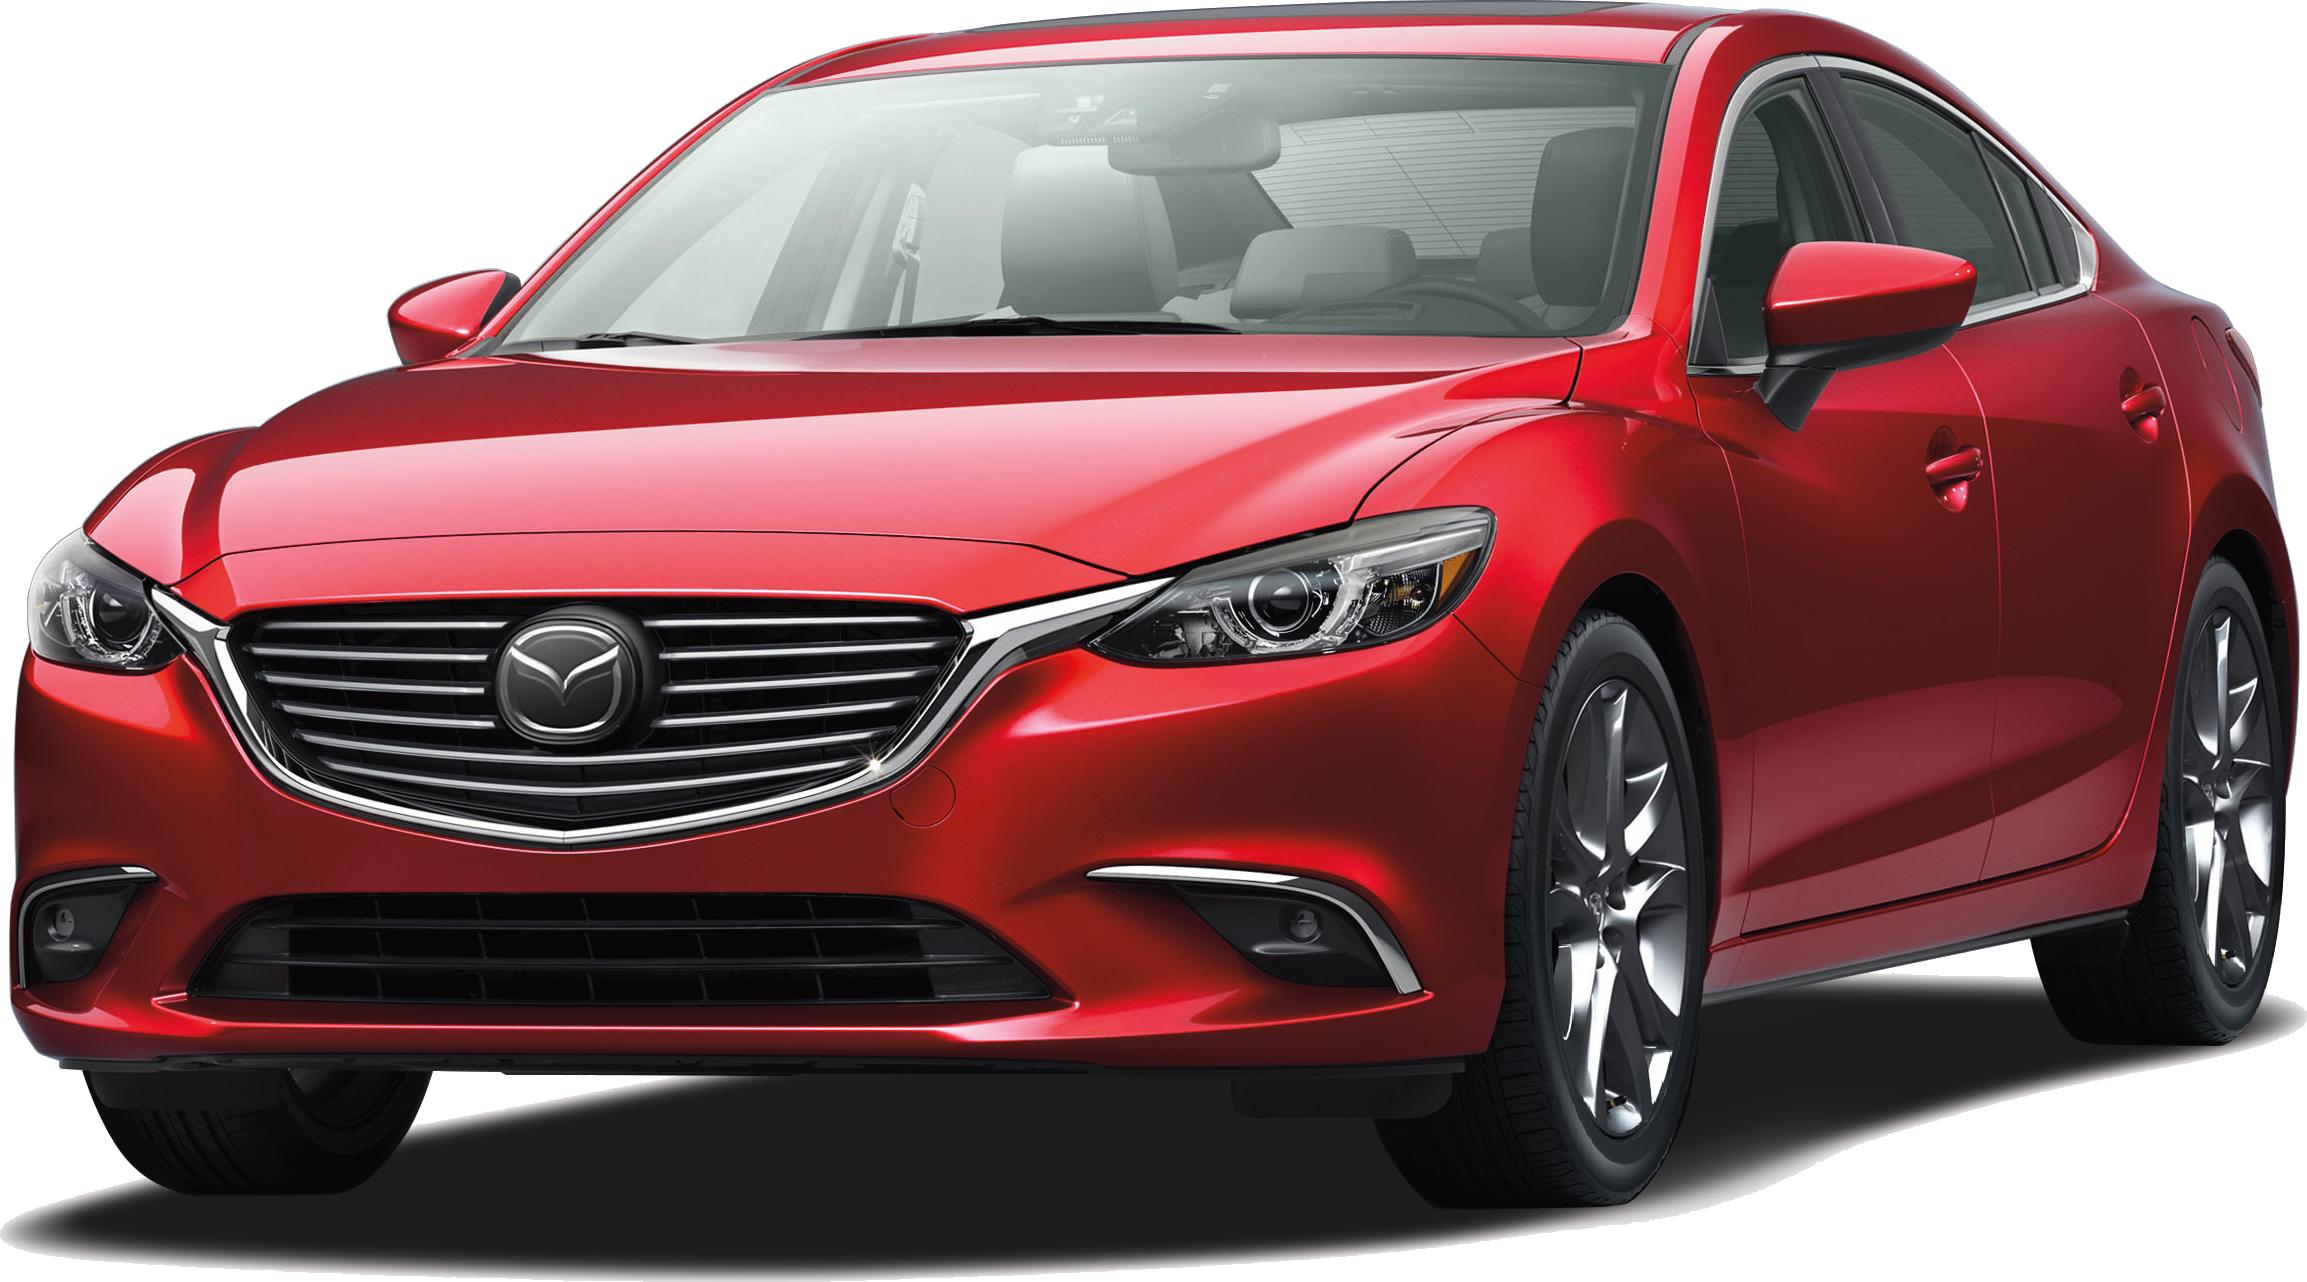 Mazda car PNG images free download.